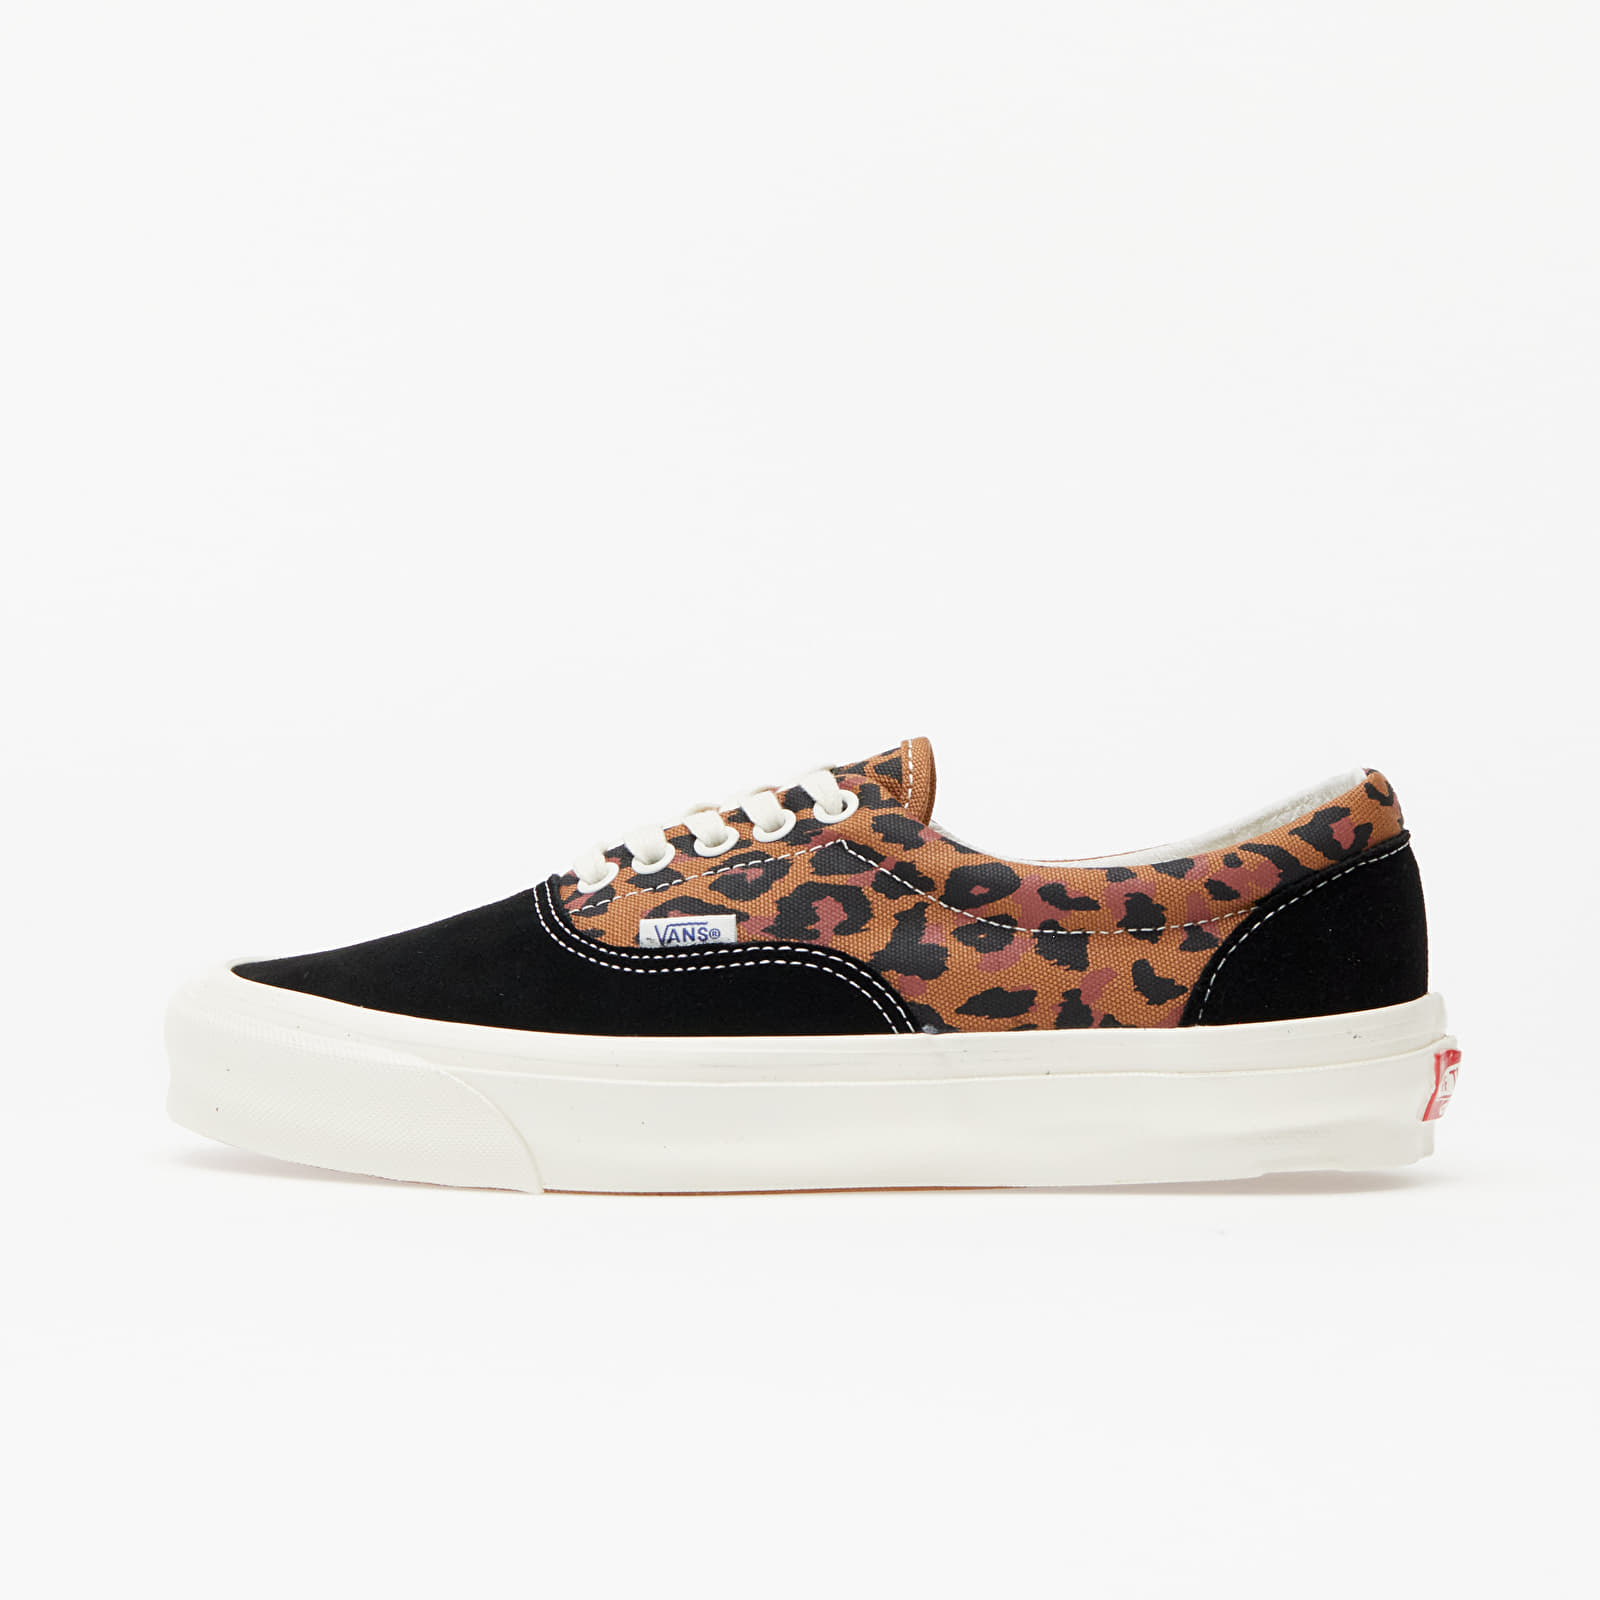 Vans OG Era LX (Suede/ Canvas) Leopard/ Marshmallow EUR 42